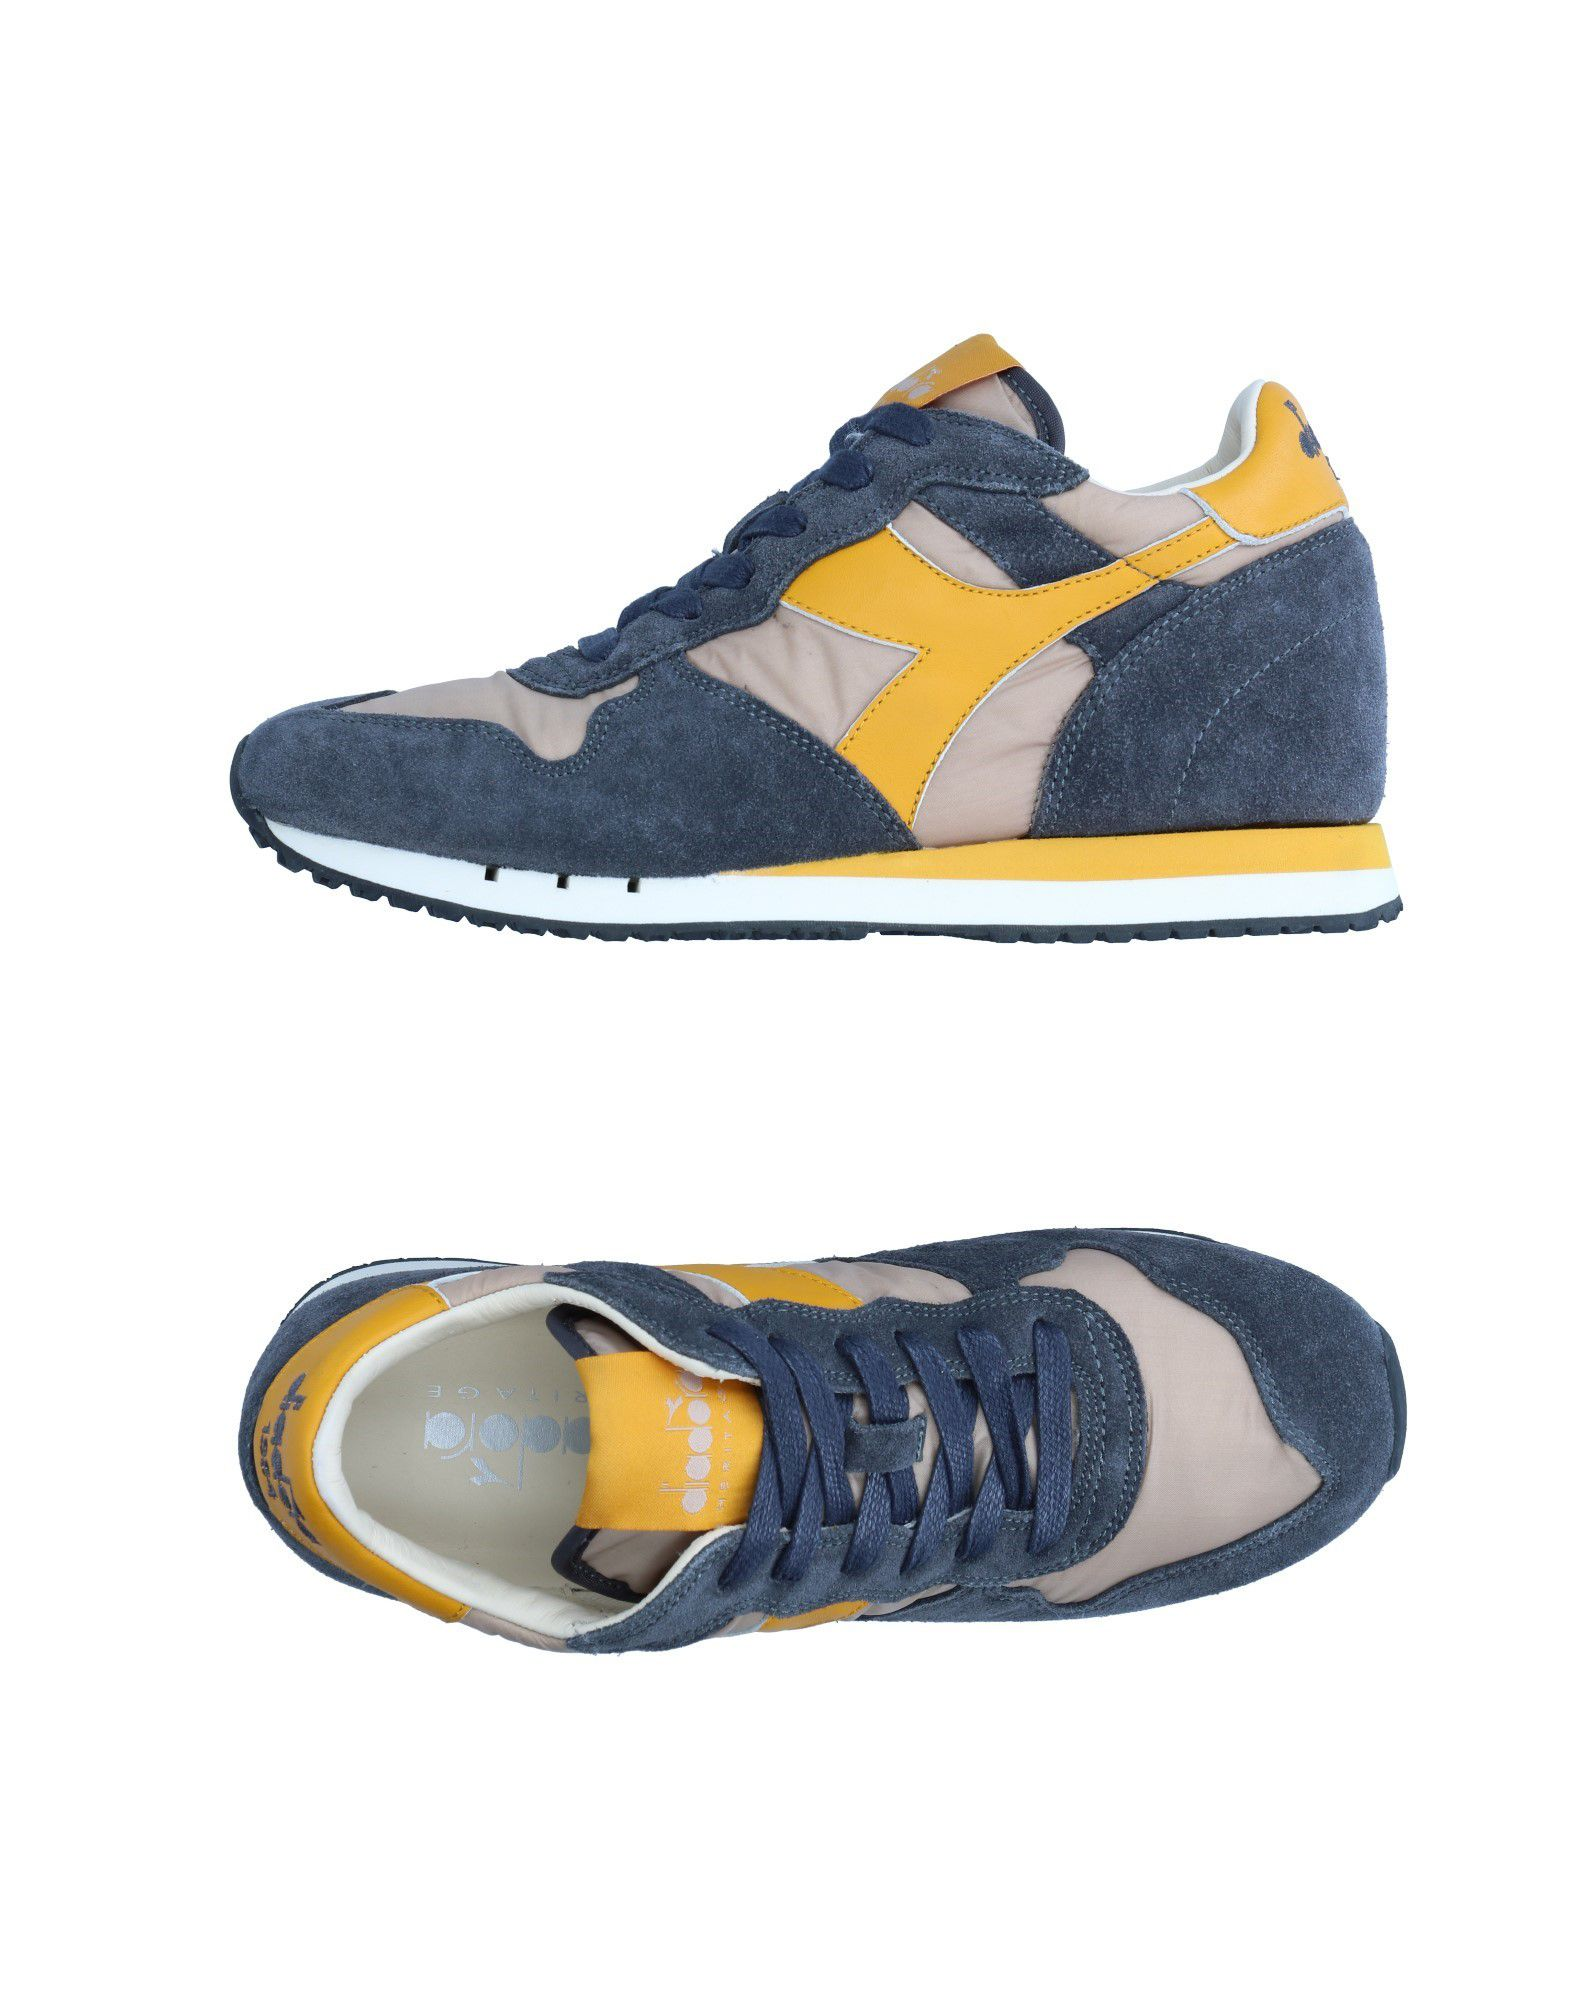 Diadora Heritage Sneakers Sneakers Heritage Damen  11231619PO Gute Qualität beliebte Schuhe 327e93